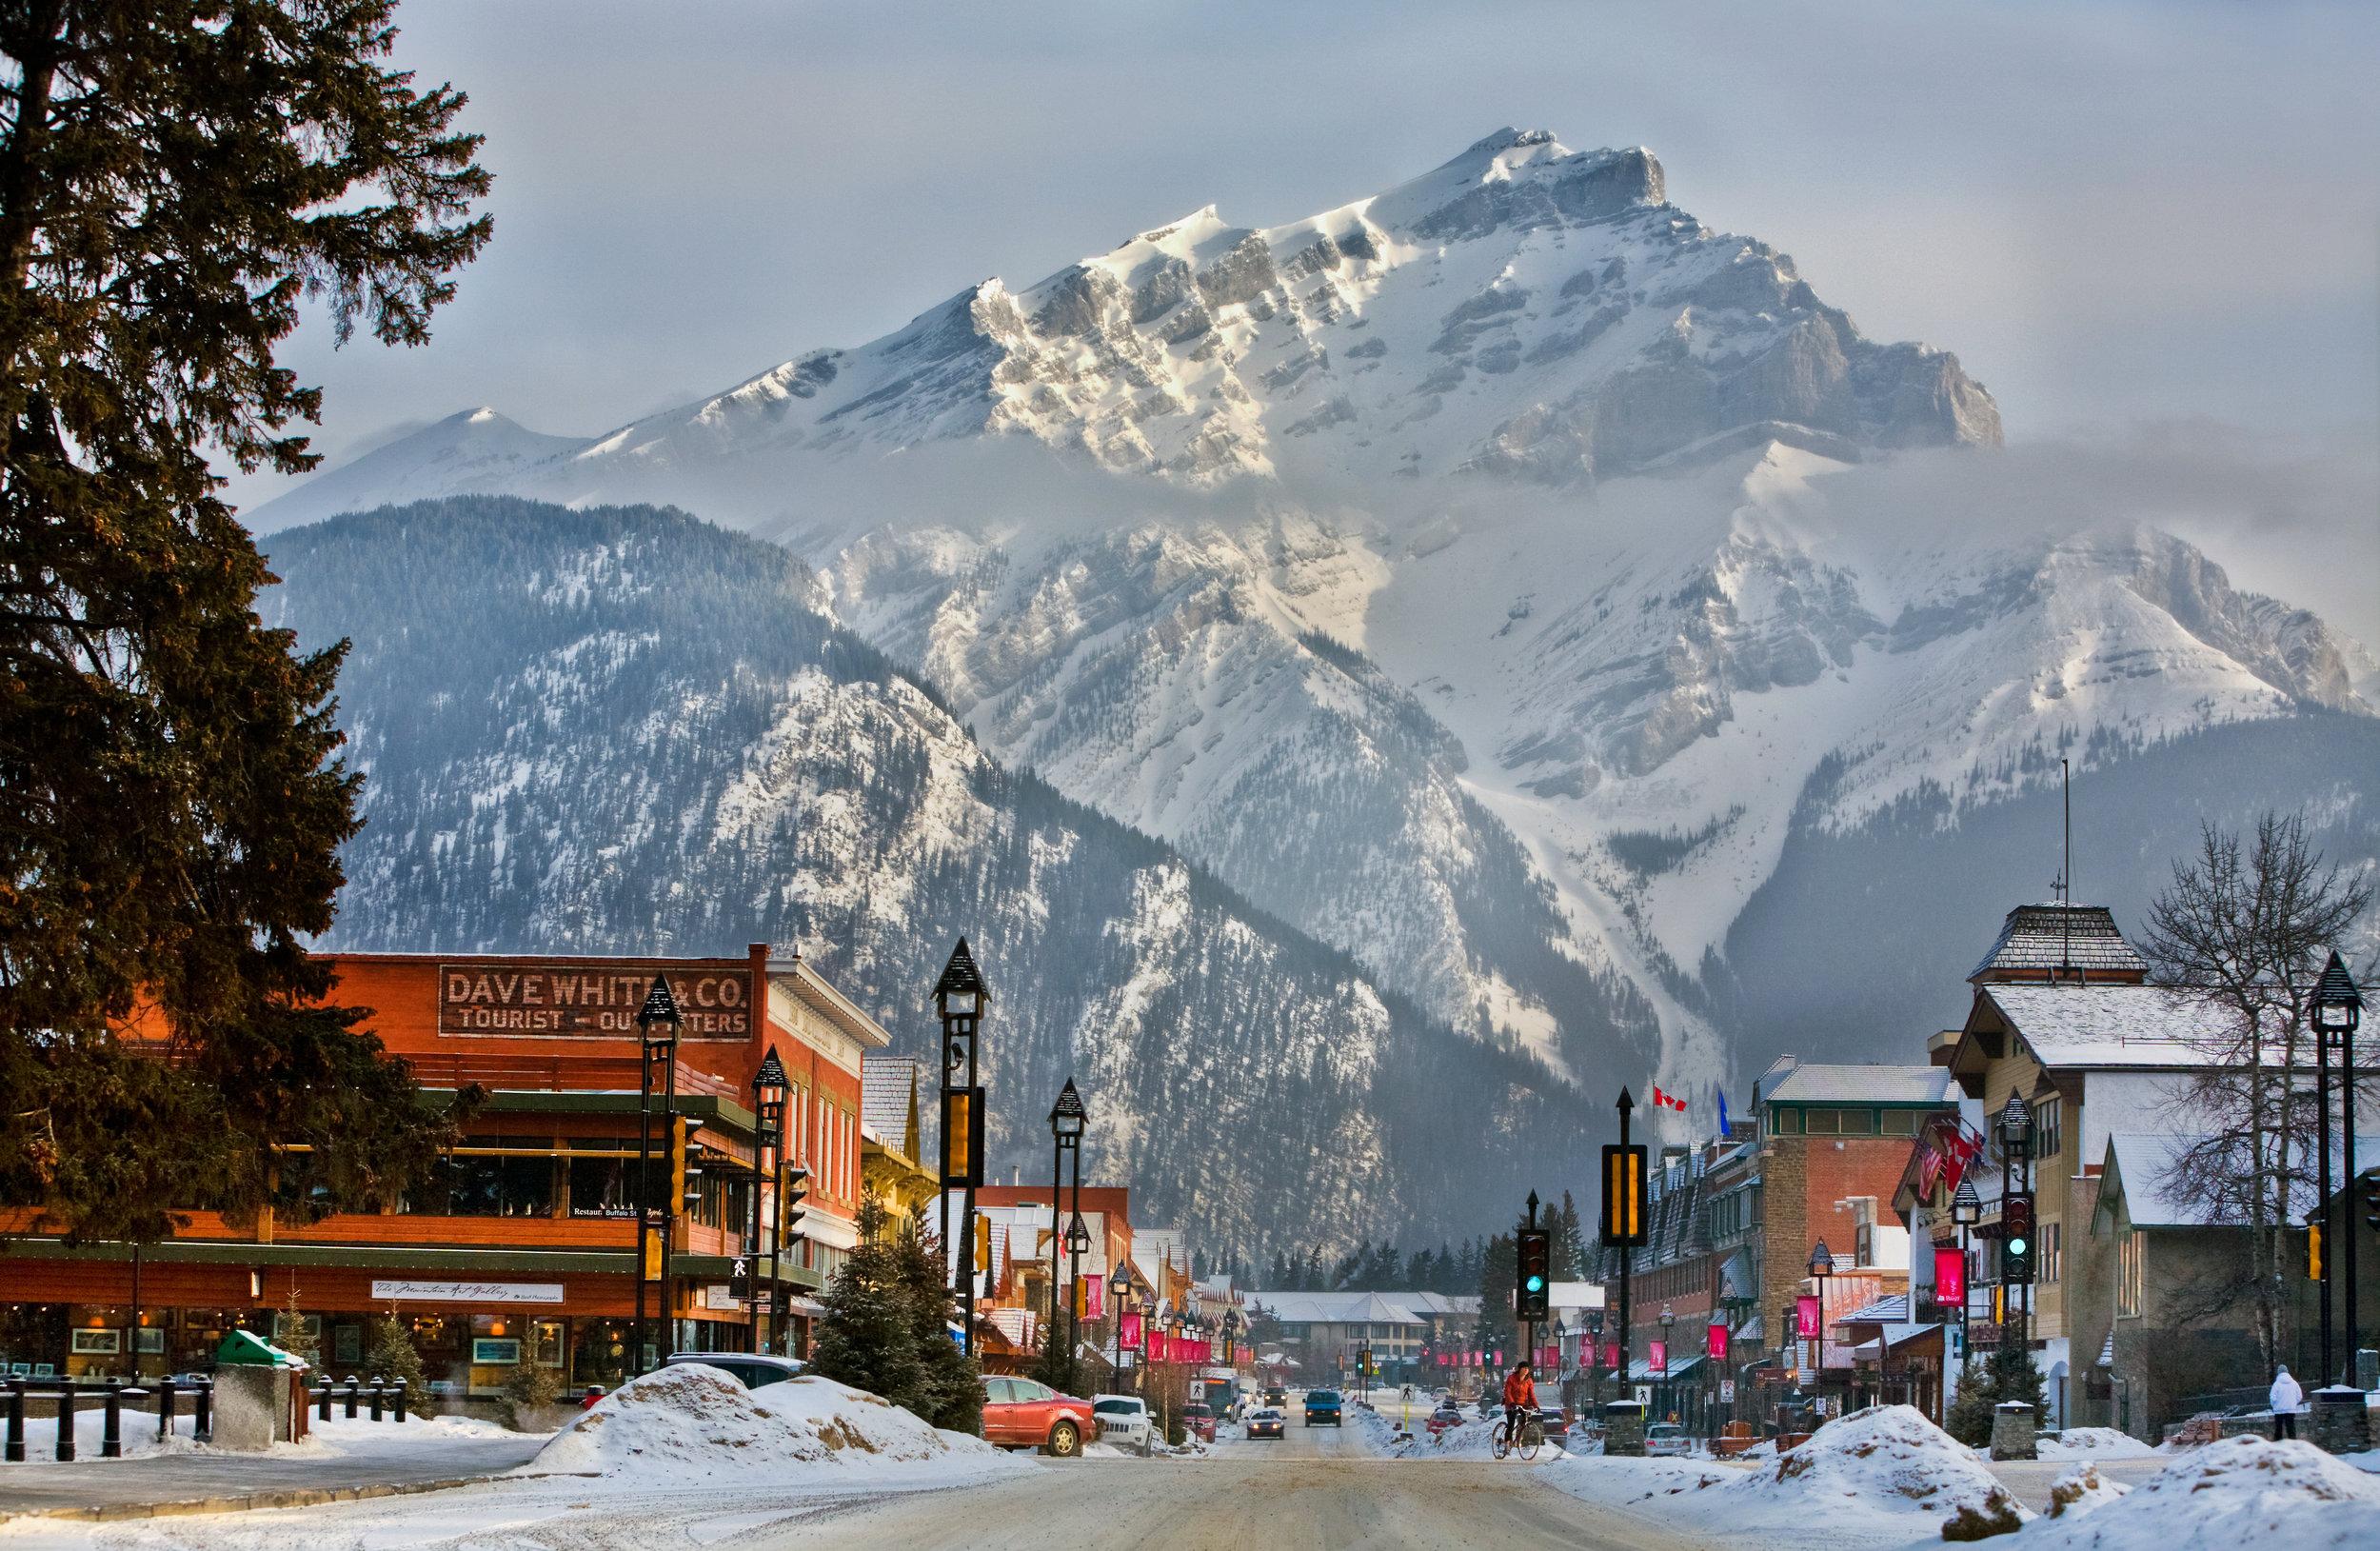 Banff Lake Louise Tourism / Paul Zizka Photography